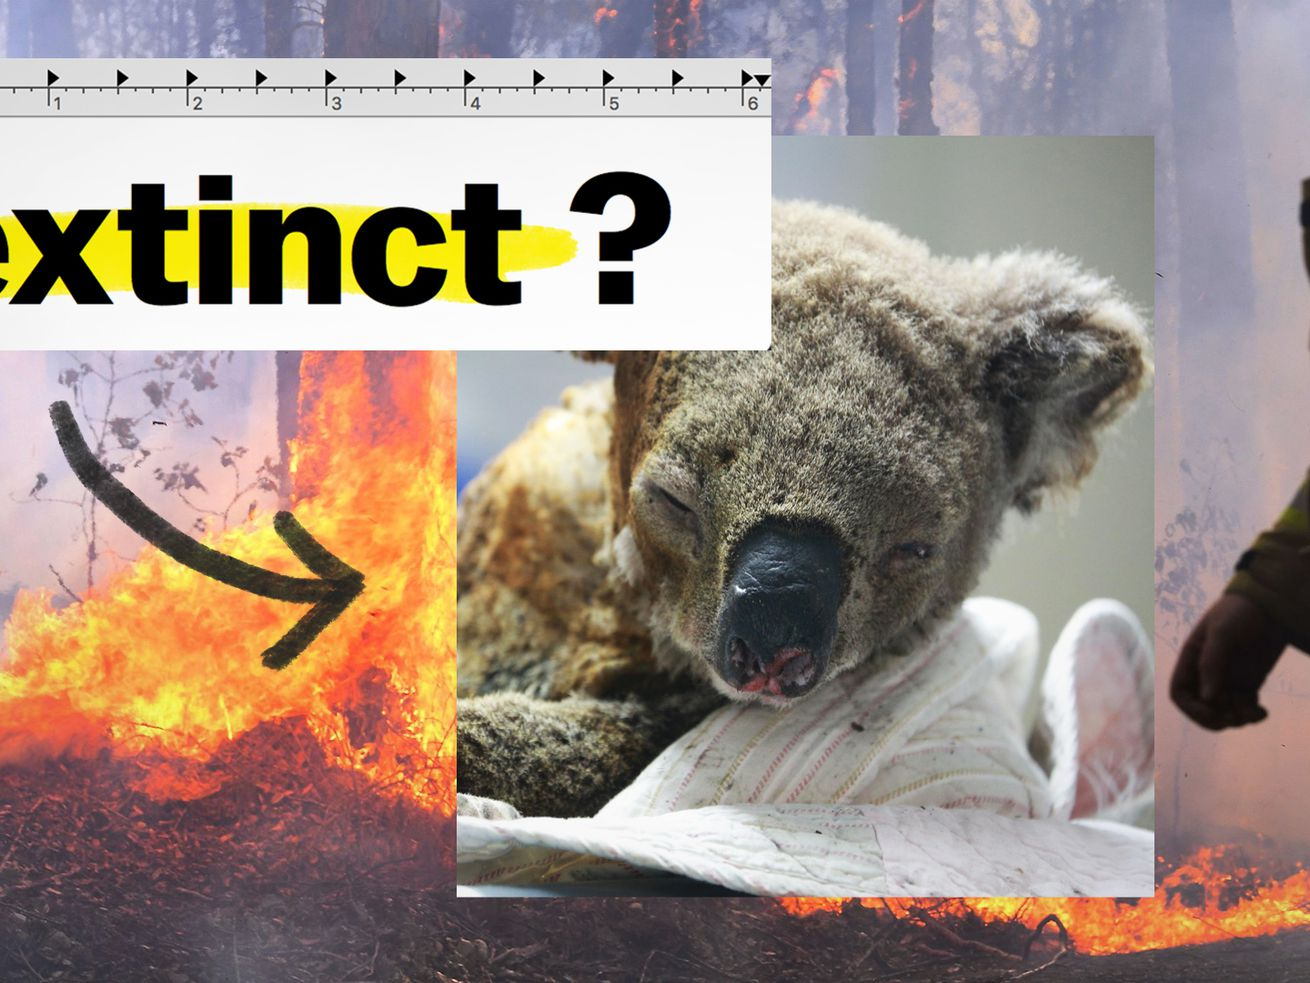 Are Australia's koalas going extinct? We asked an ecologist., Wustoo